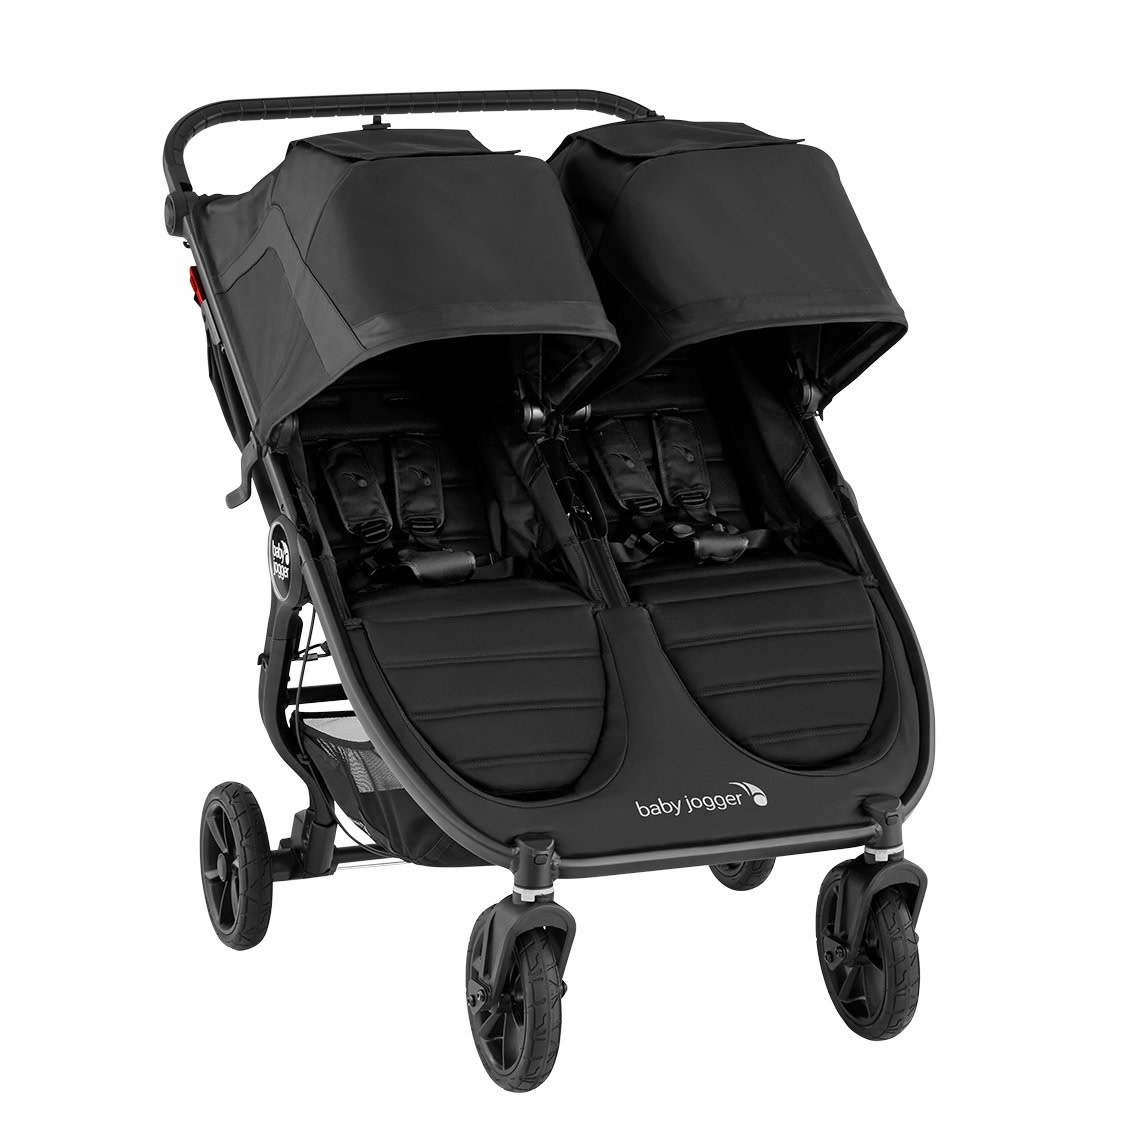 BabyJogger Baby Jogger City Mini GT 2 Double - Steel/Grey